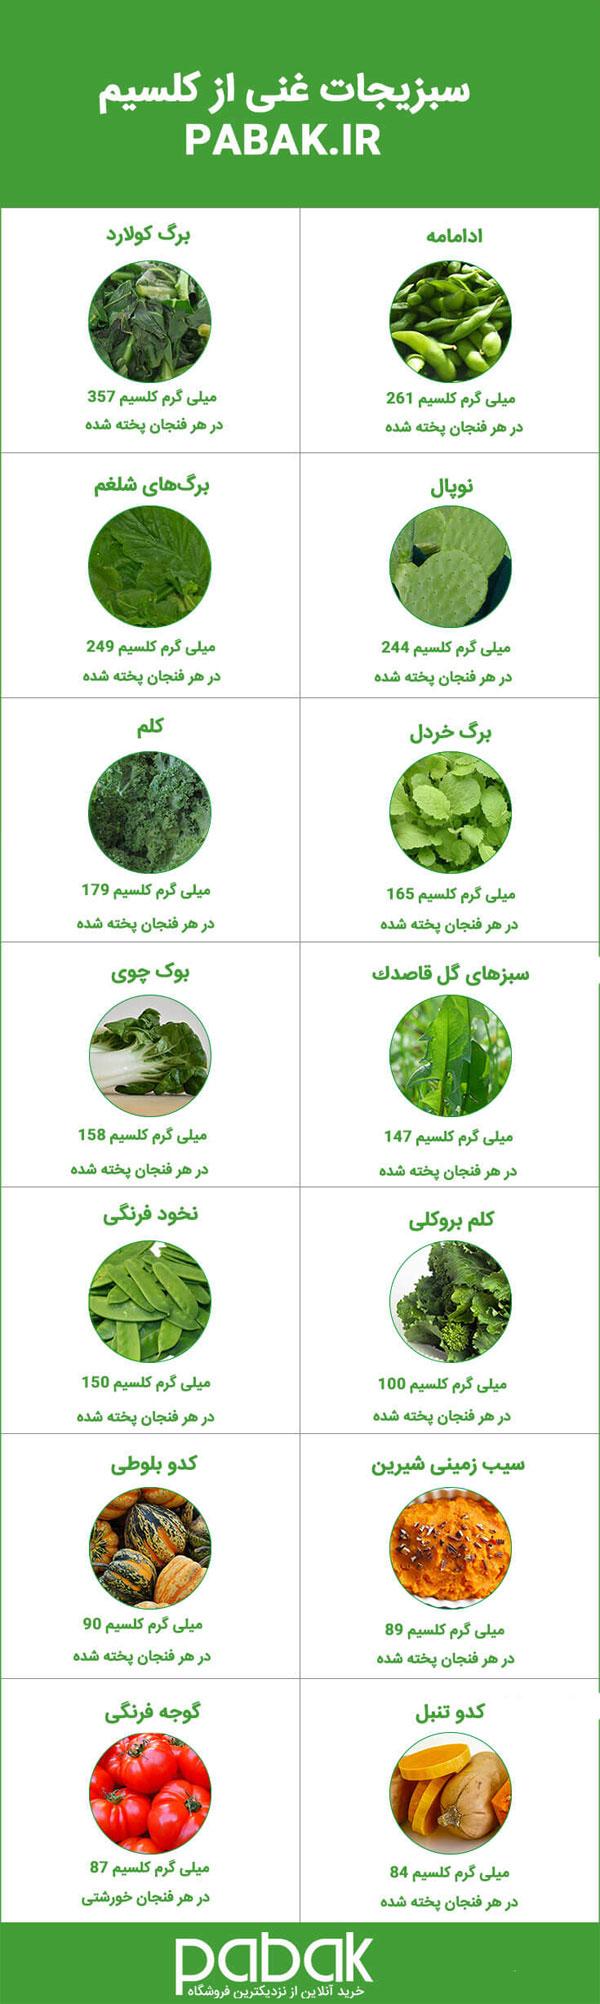 Plant sources of calcium pabak 2 - منابع گیاهی کلسیم